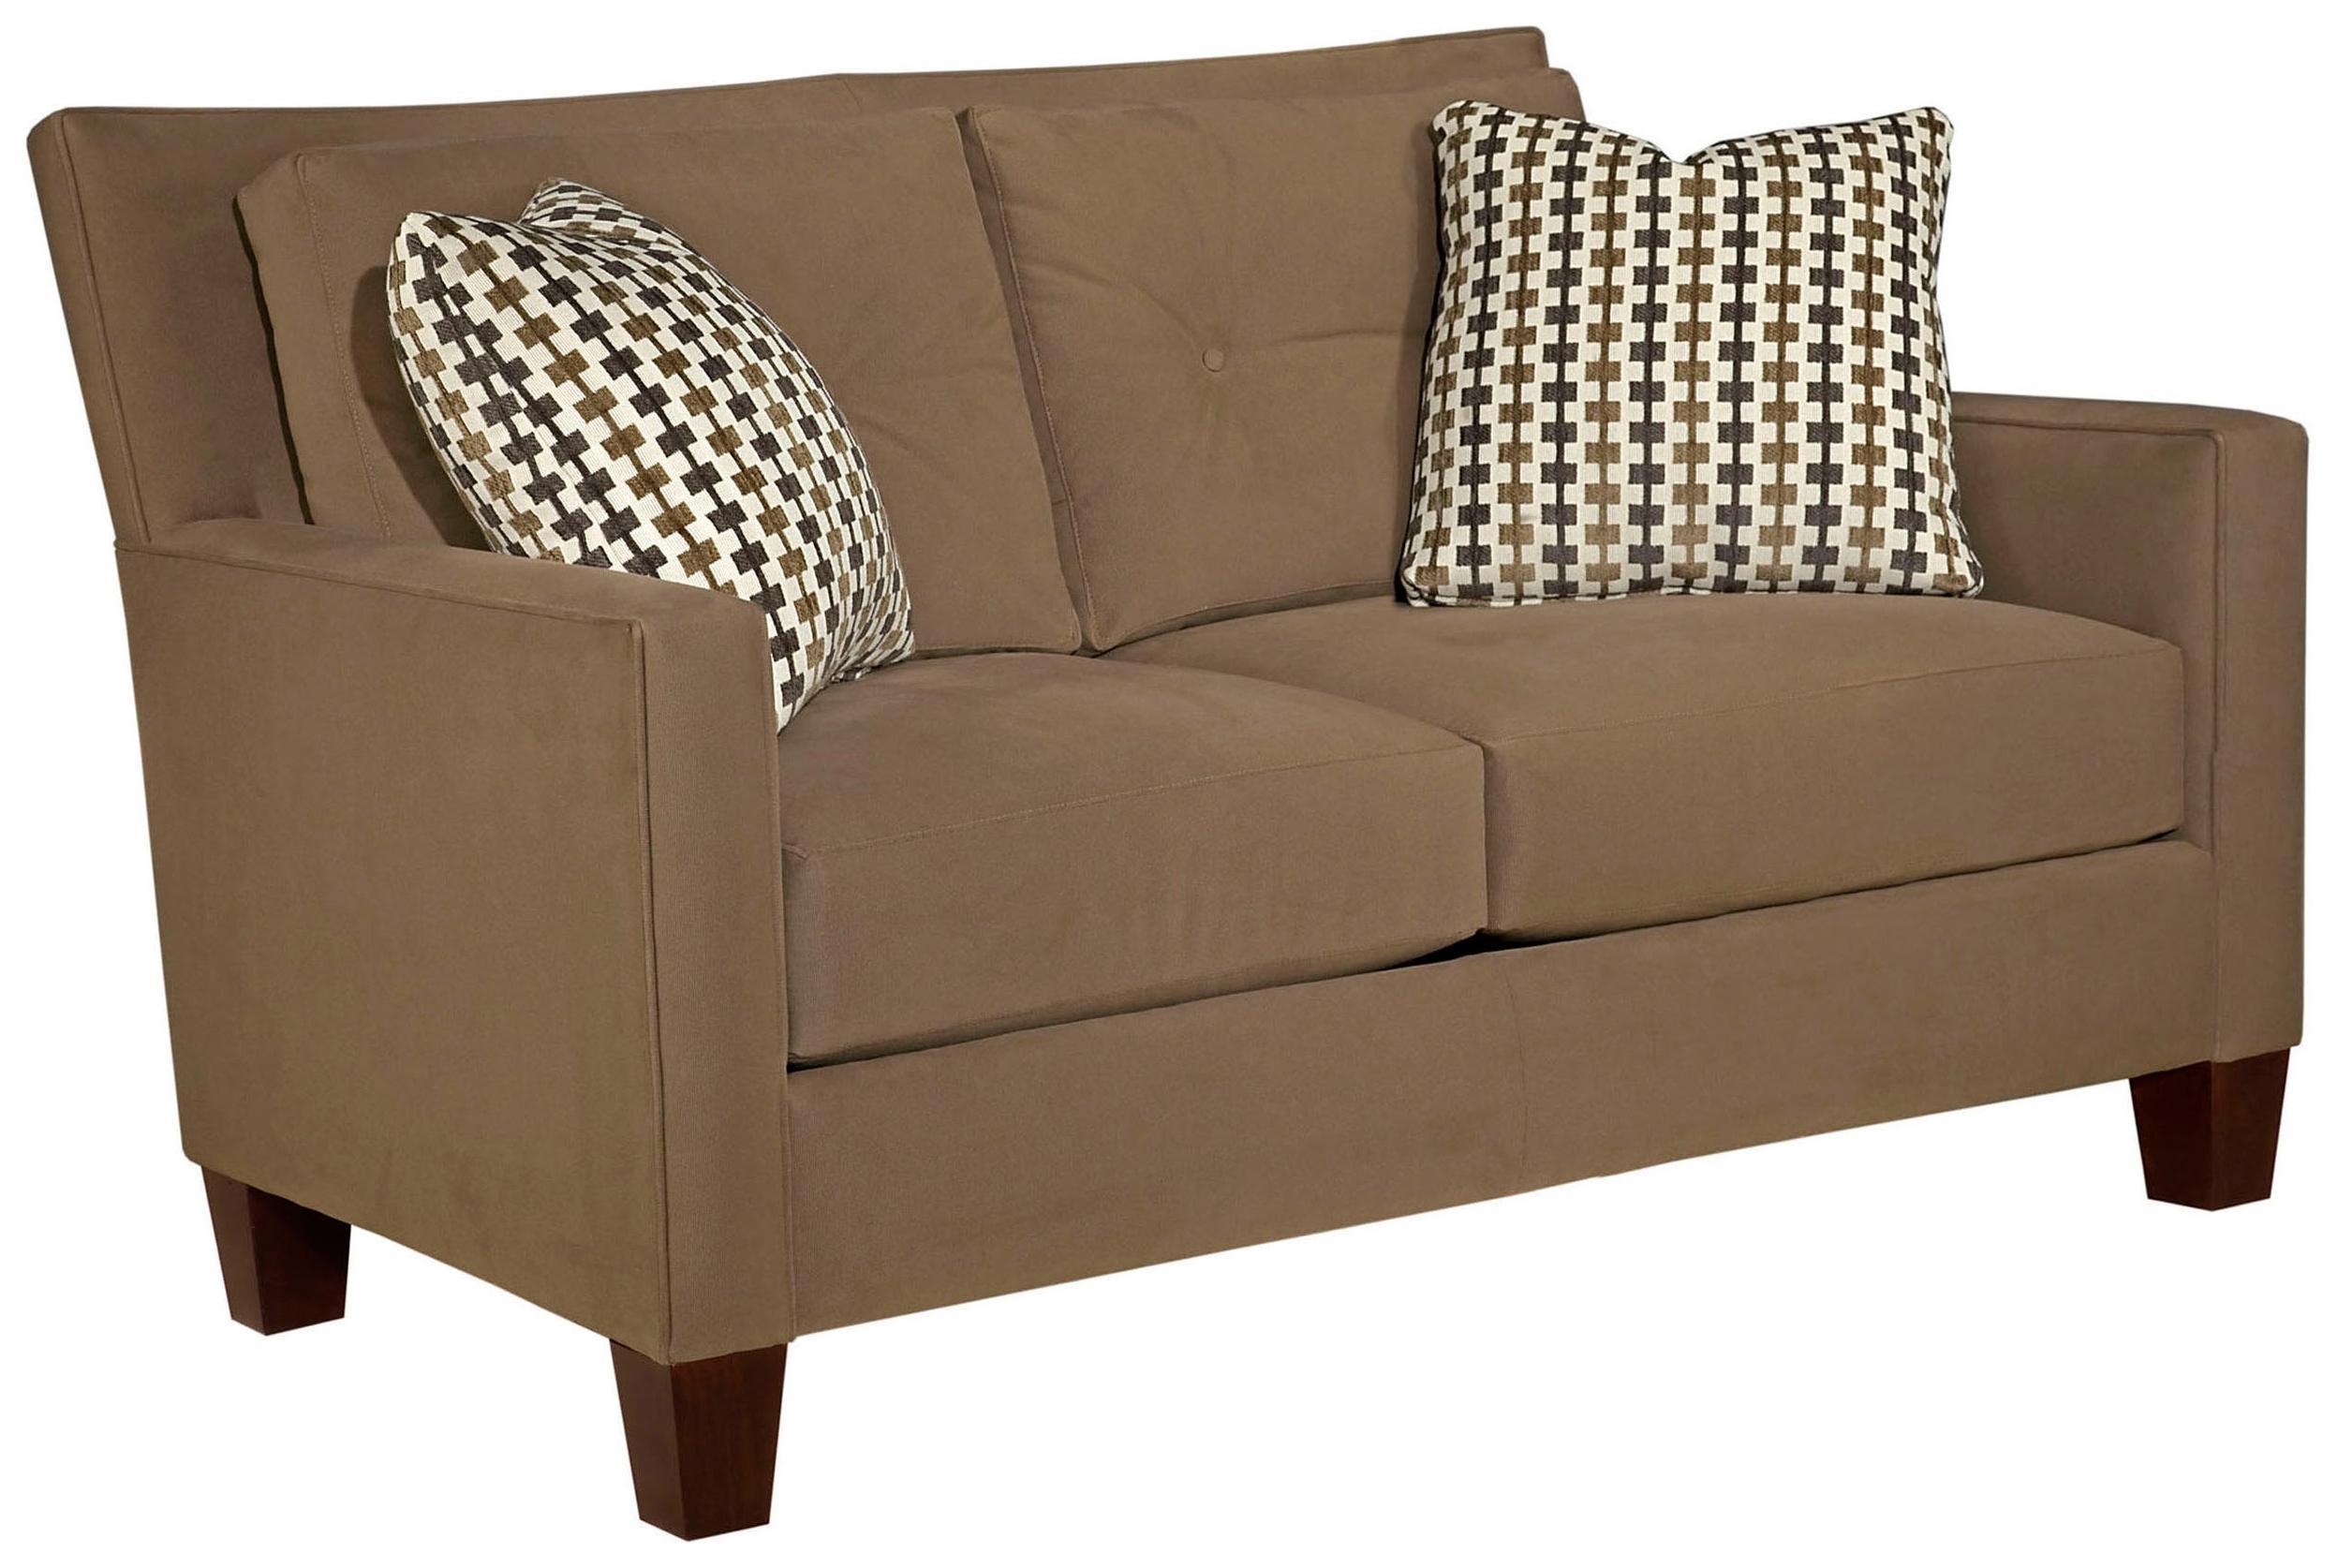 Broyhill Furniture Jevin Modern Loveseat - Item Number: 6018-1